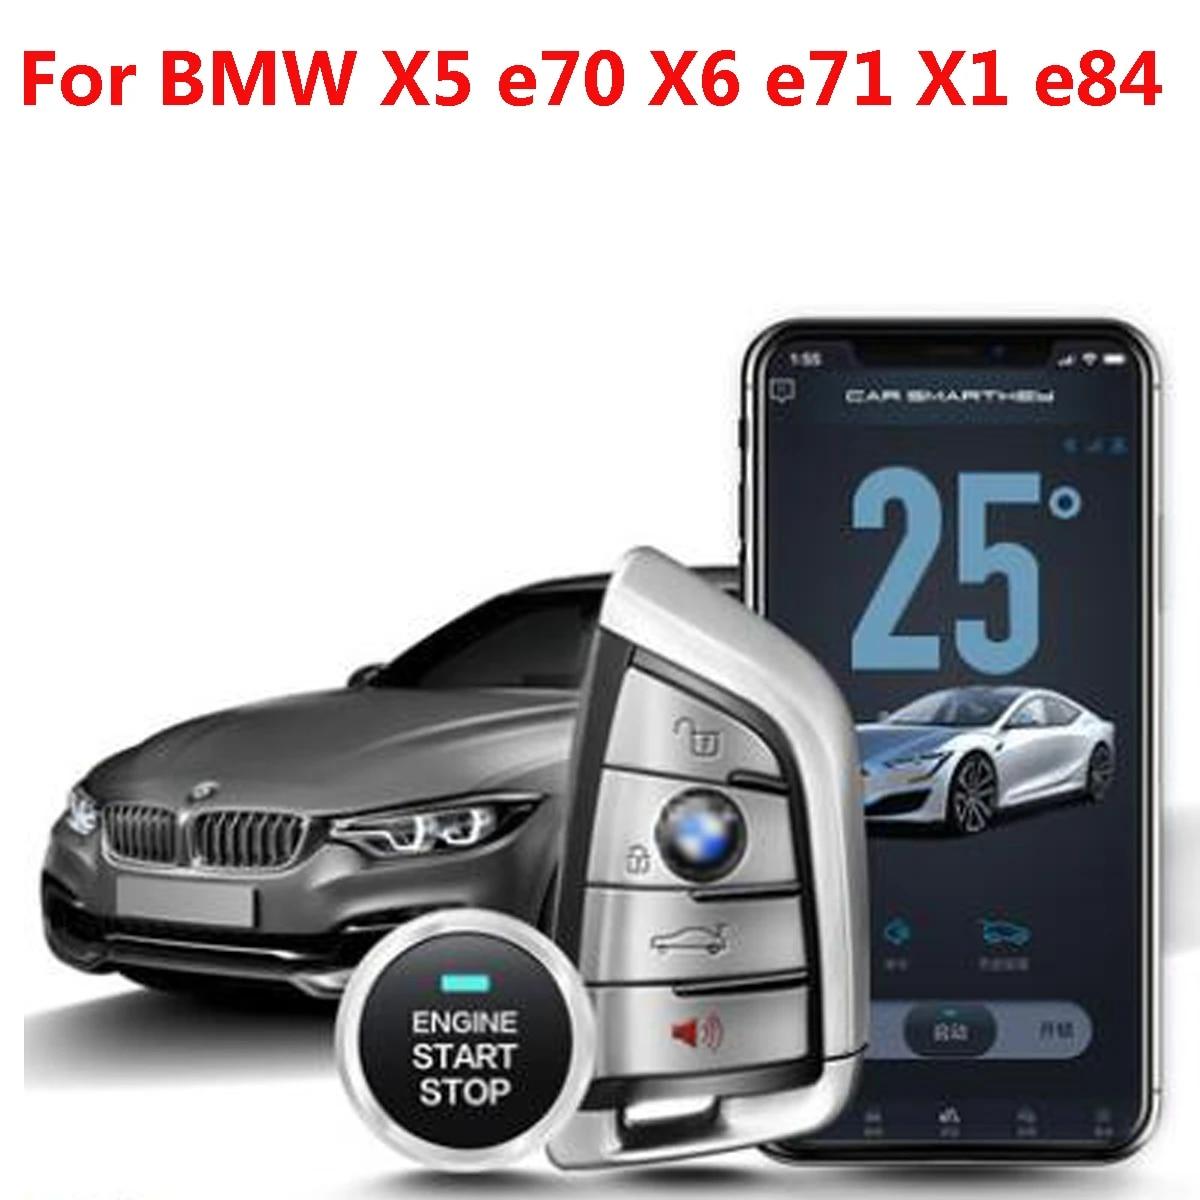 Plusobd For Bmw X5 E70 X6 E71 X1e84 Car Alarm Gps Tracking Engine Remote Start Stop System Keyless Start Keyless Go Plug Play Starter Parts Aliexpress